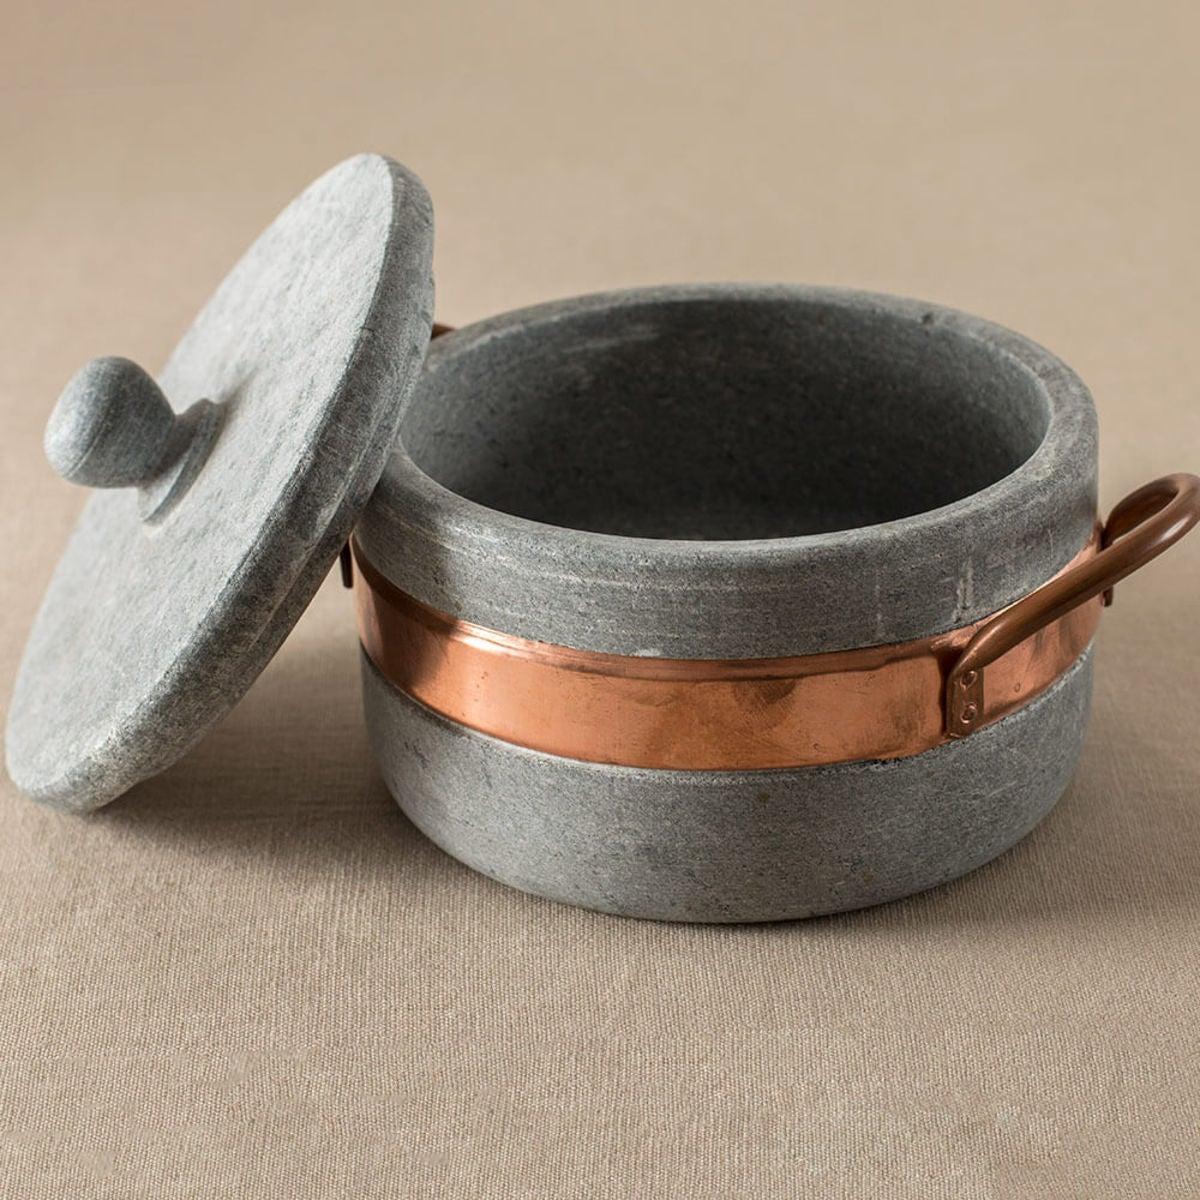 Brazilian Soapstone Cookware Collection Signature Rock